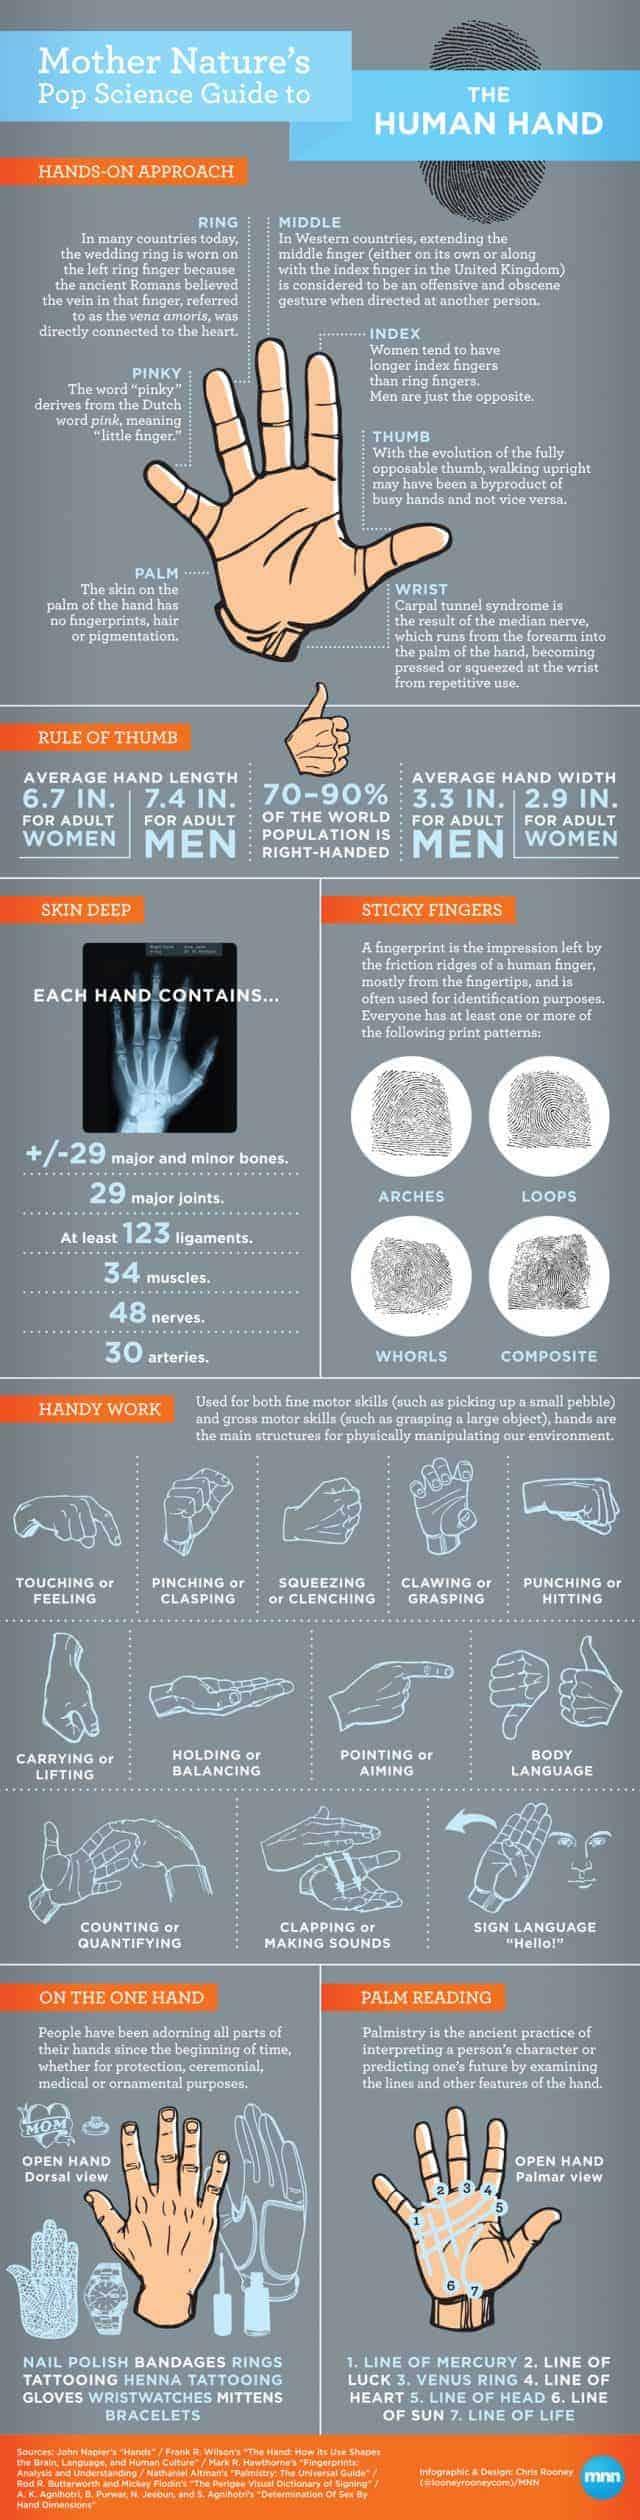 the-human-hand-640x2520